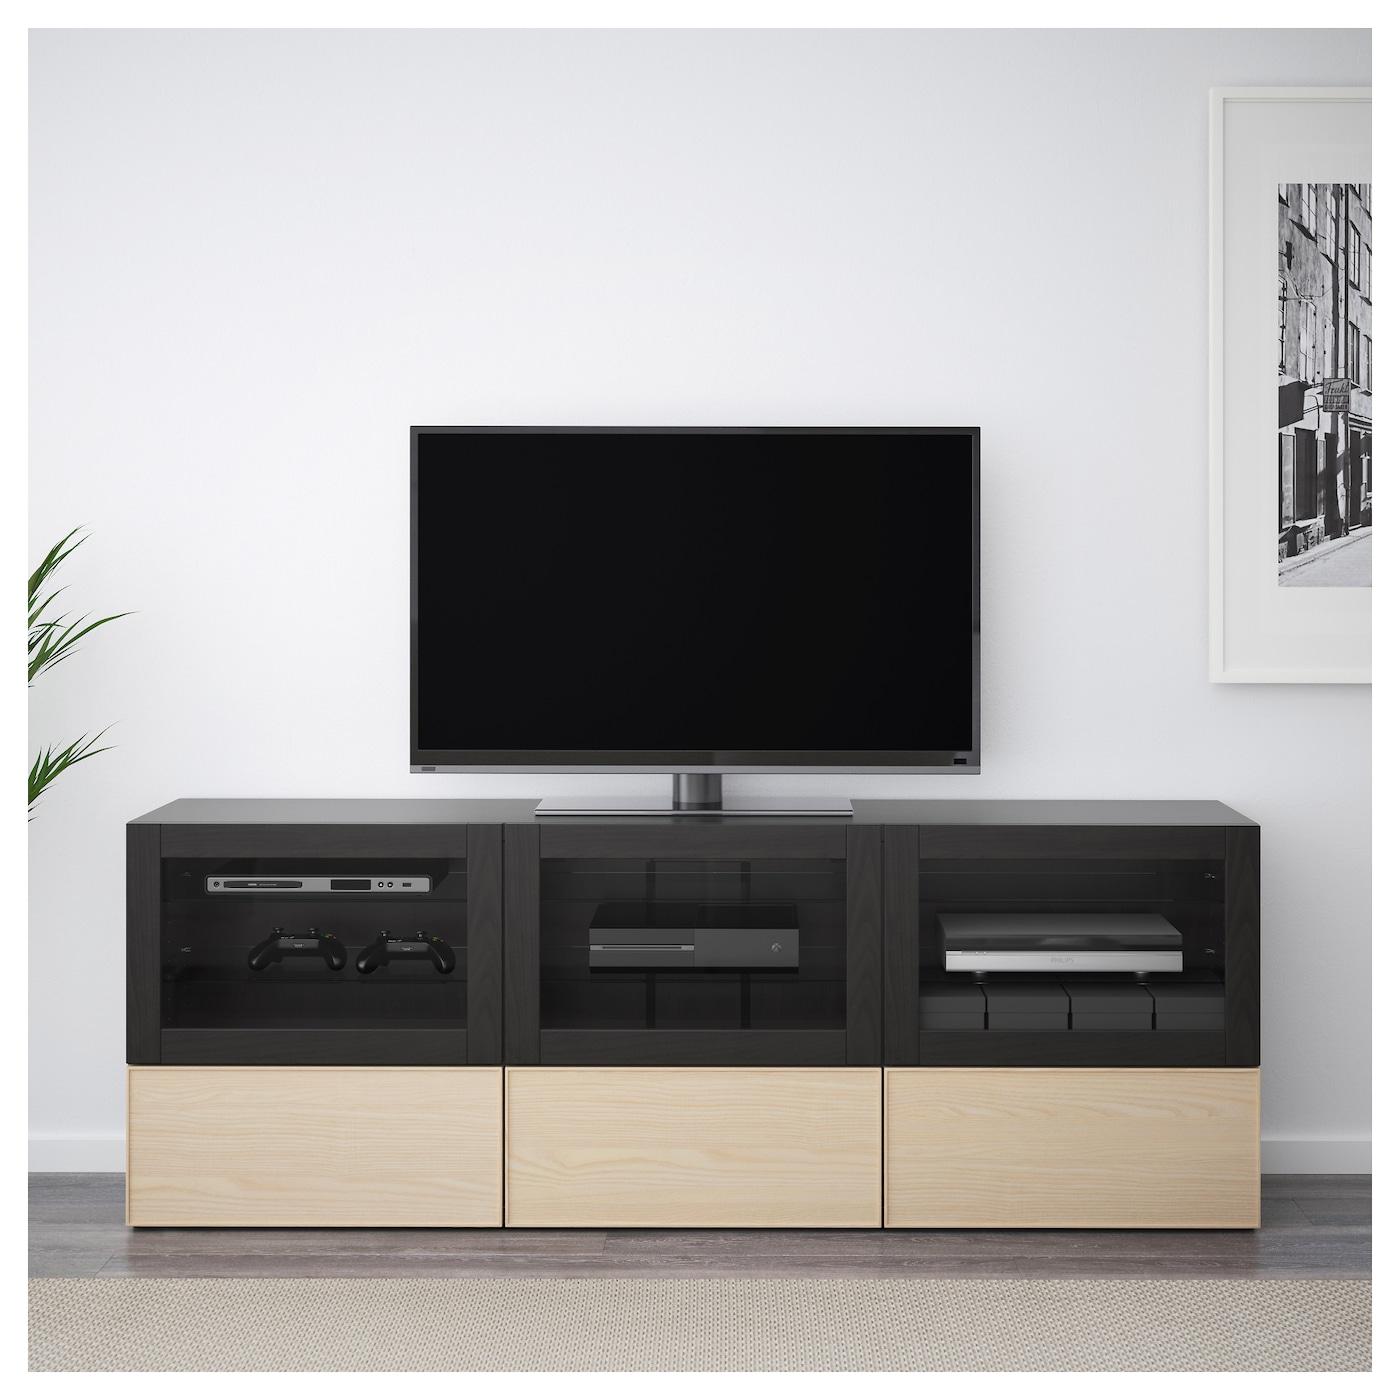 Best mueble tv con almacenaje negro marr n sindvik inviken chapa fresno 180 x 40 x 64 cm ikea - Muebles almacenaje ikea ...